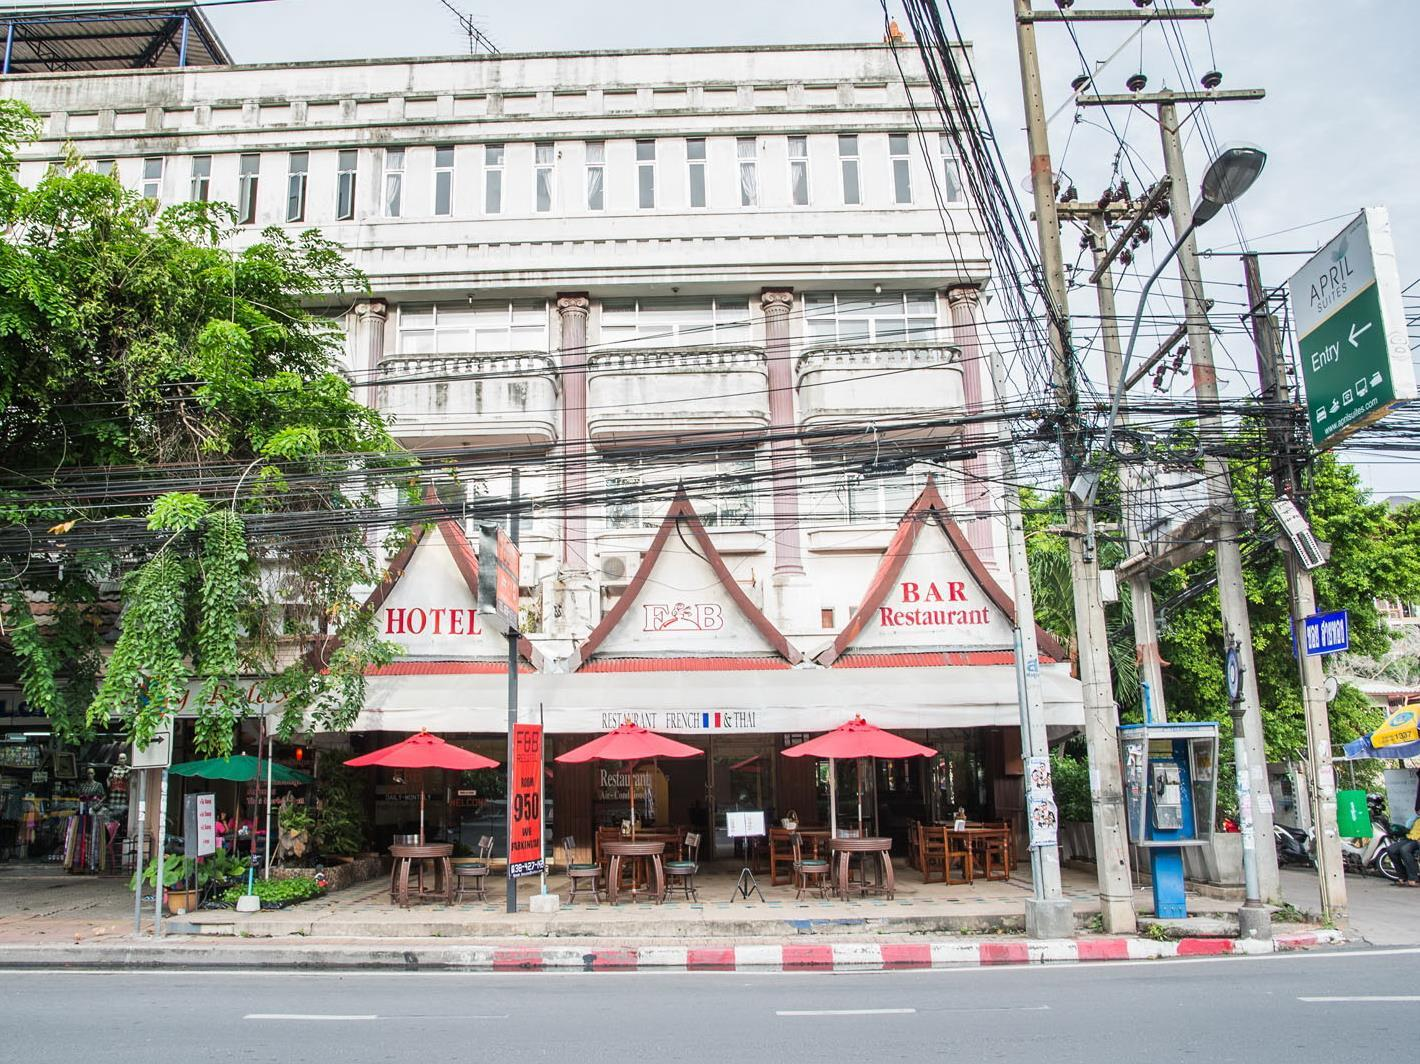 F and B Hotel-Bar-Restaurant